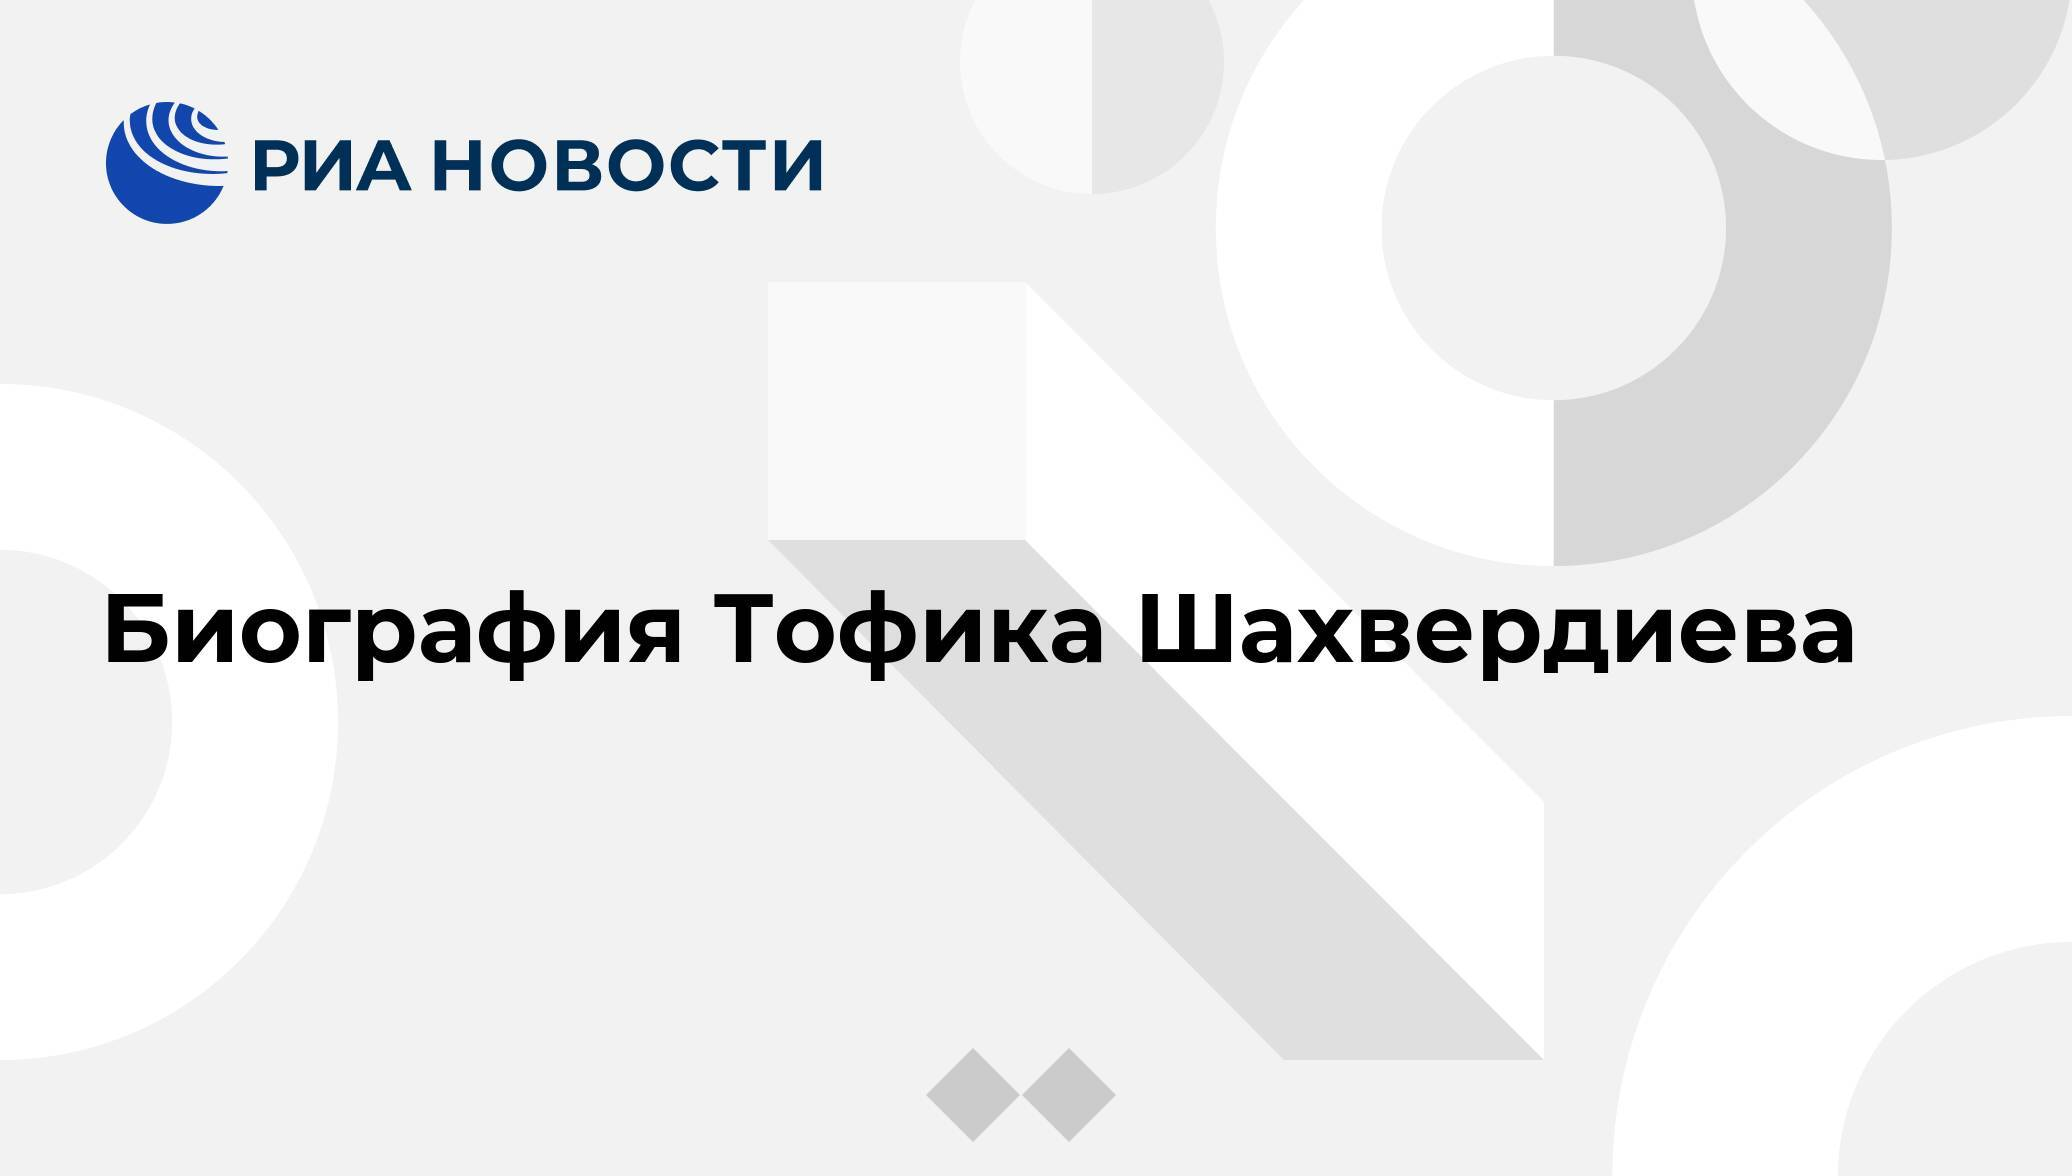 Wikizero - шахвердиев, тофик рзакулиевич